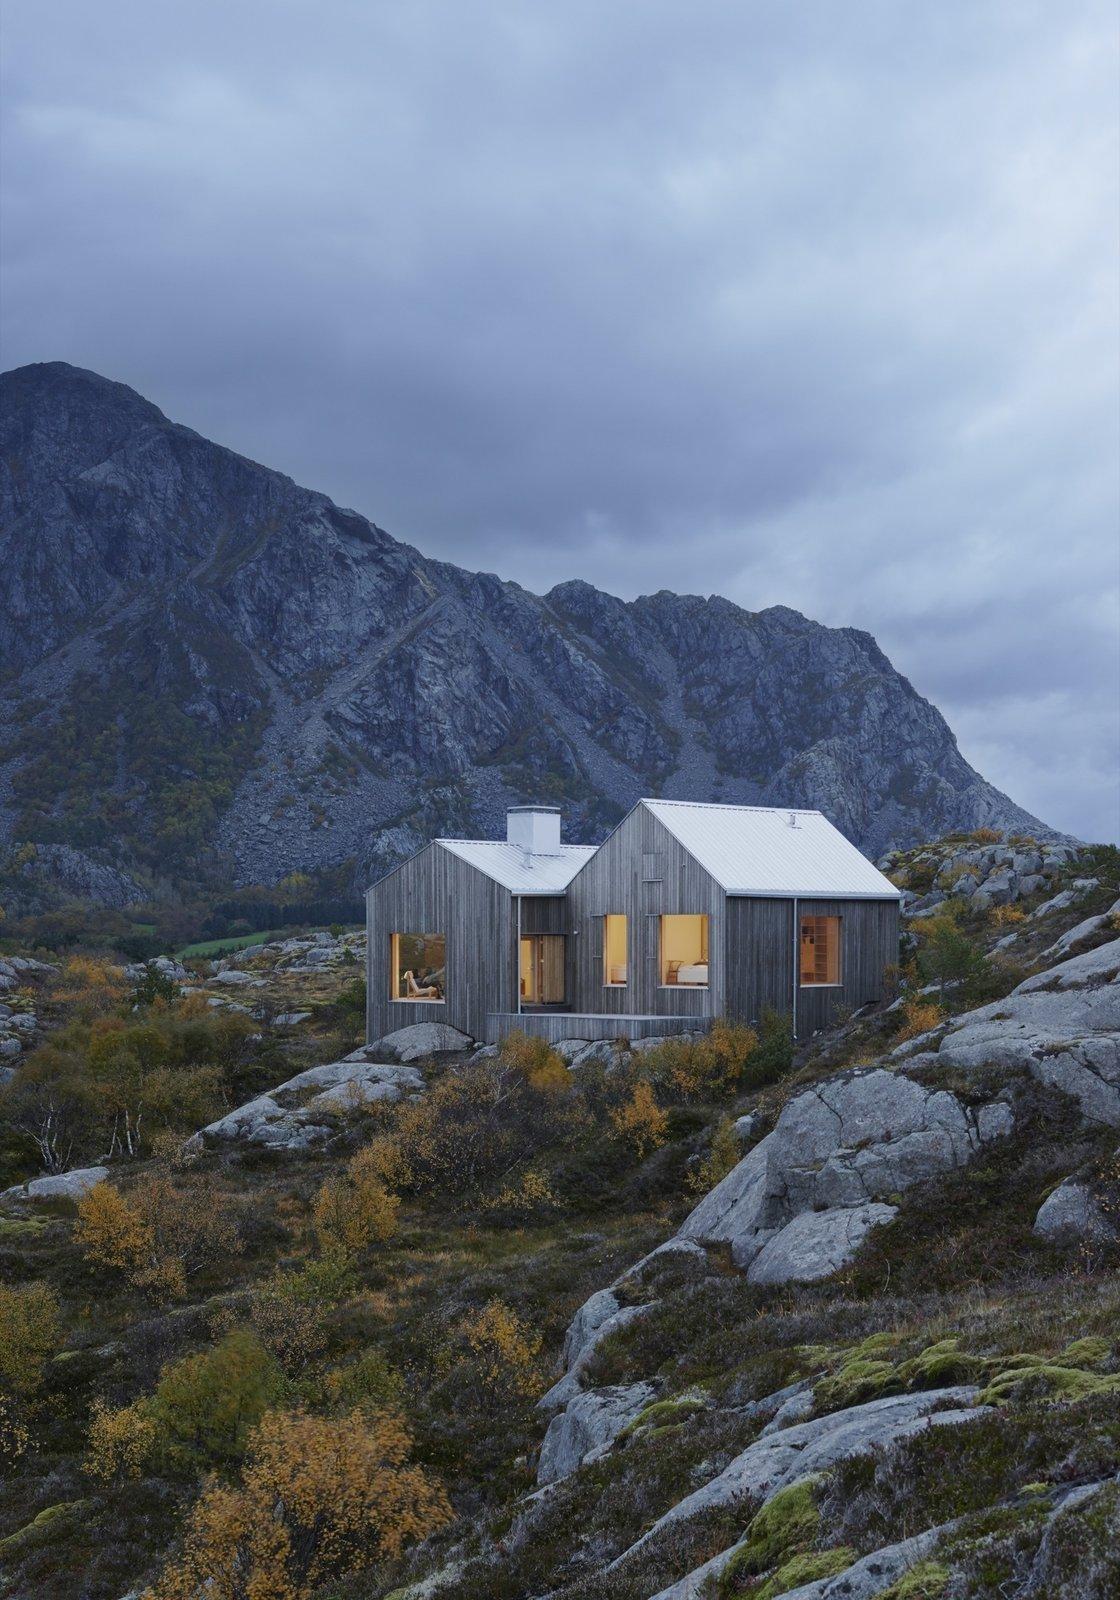 Naked Naust | Vega Island, Norway  A dramatic cabin by Swedish architect Erik Kolman Janouch on Norway's wild Vega Island.  Cabin Love